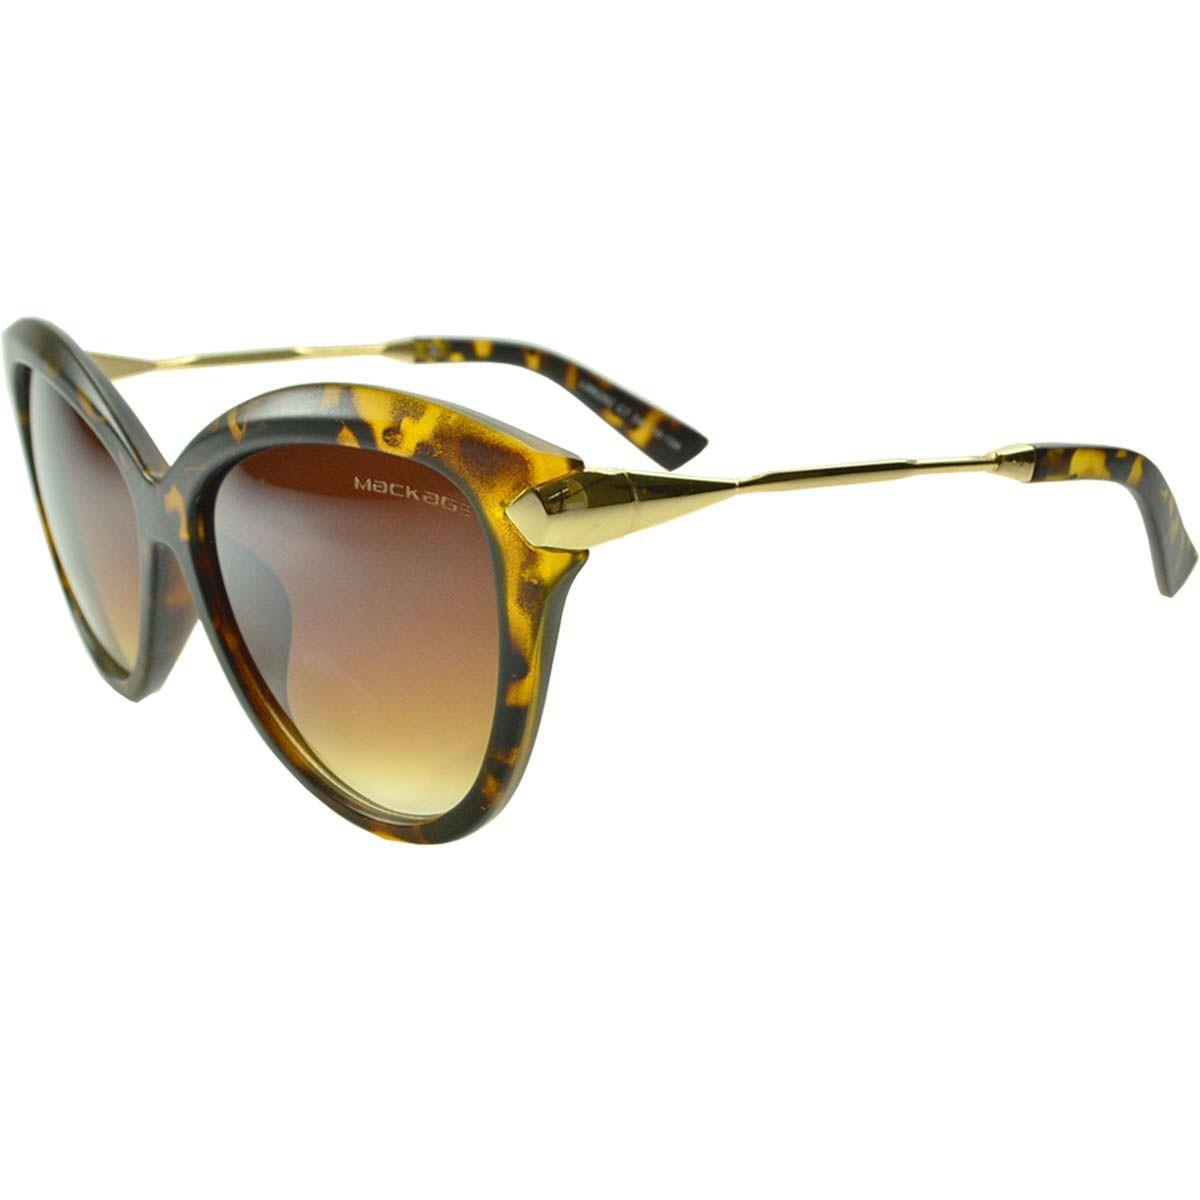 a9b0b455d Óculos De Sol Feminino Mackage Mk9282t Tarta - R$ 59,99 em Mercado Livre